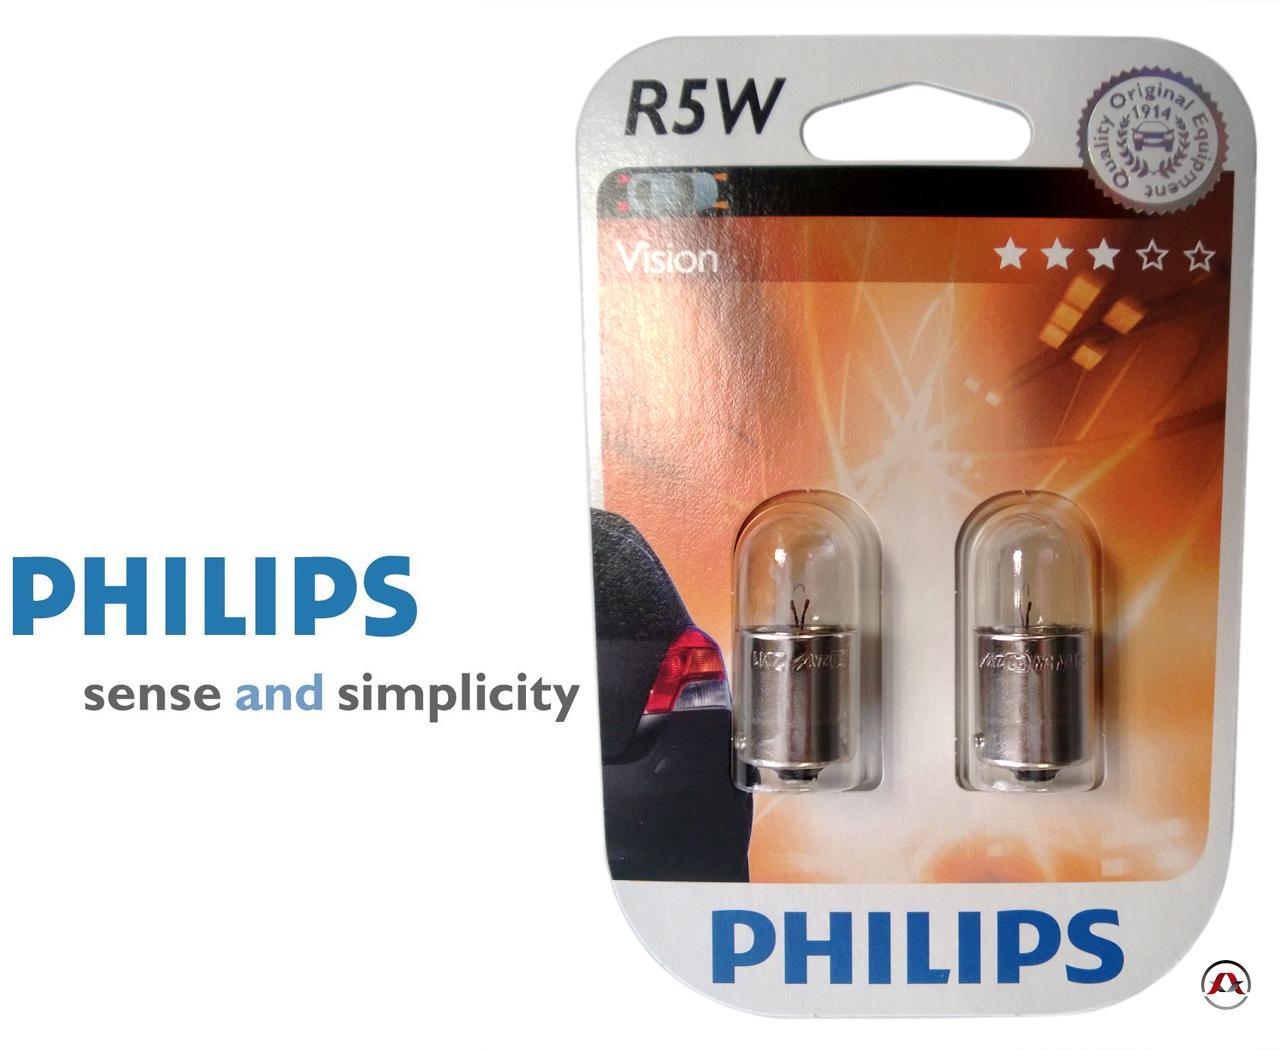 ampoule voiture ba 12v philips r5w vision philips. Black Bedroom Furniture Sets. Home Design Ideas